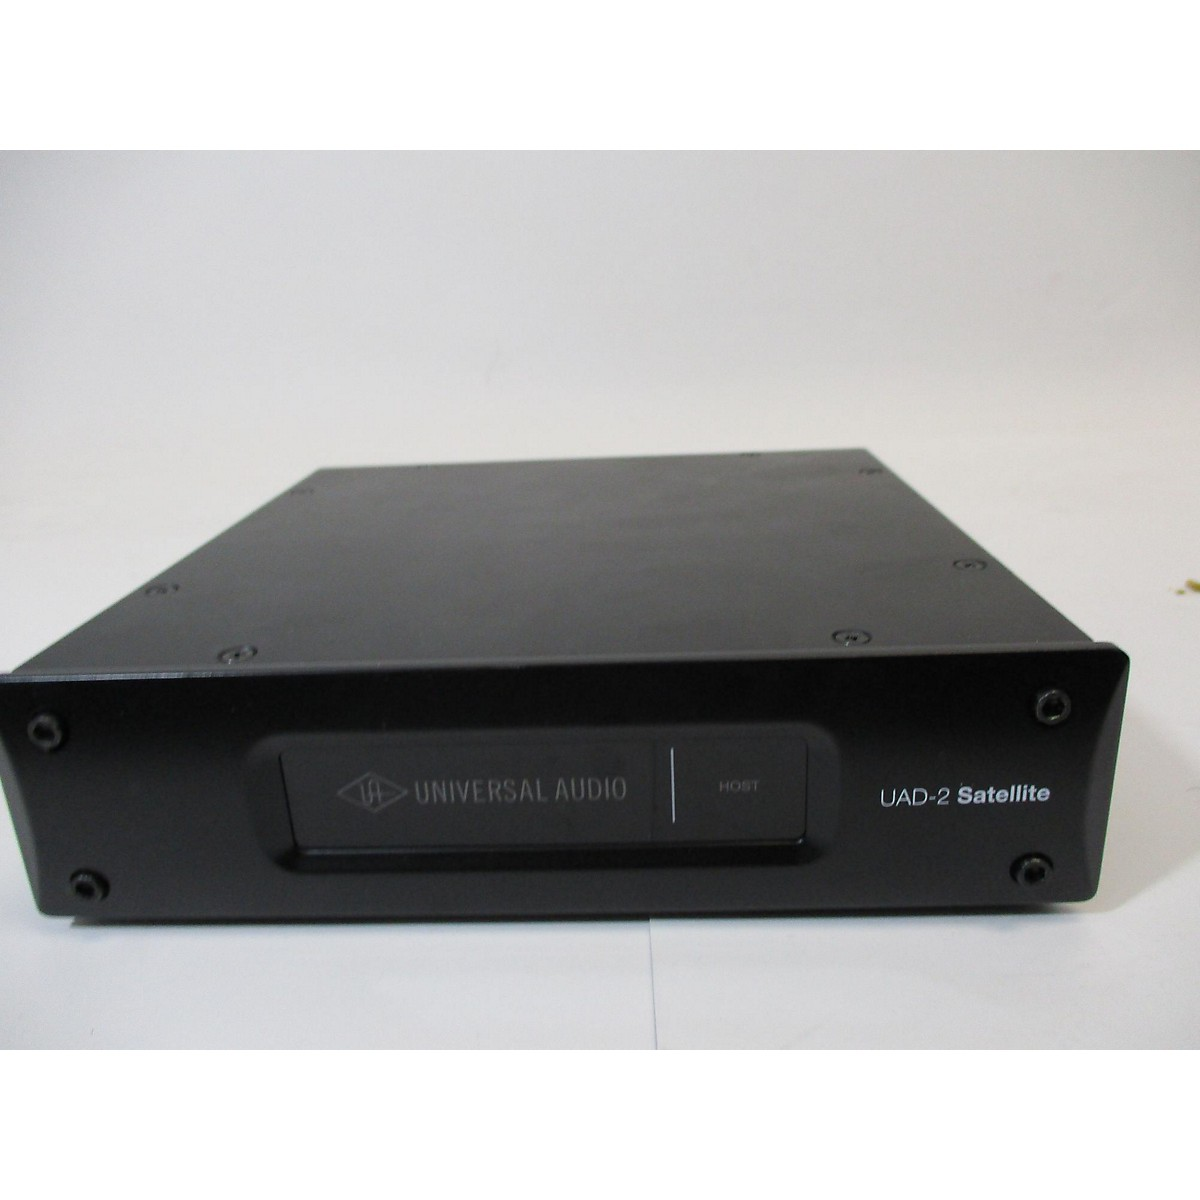 Universal Audio Uad-2 Satellite Audio Interface